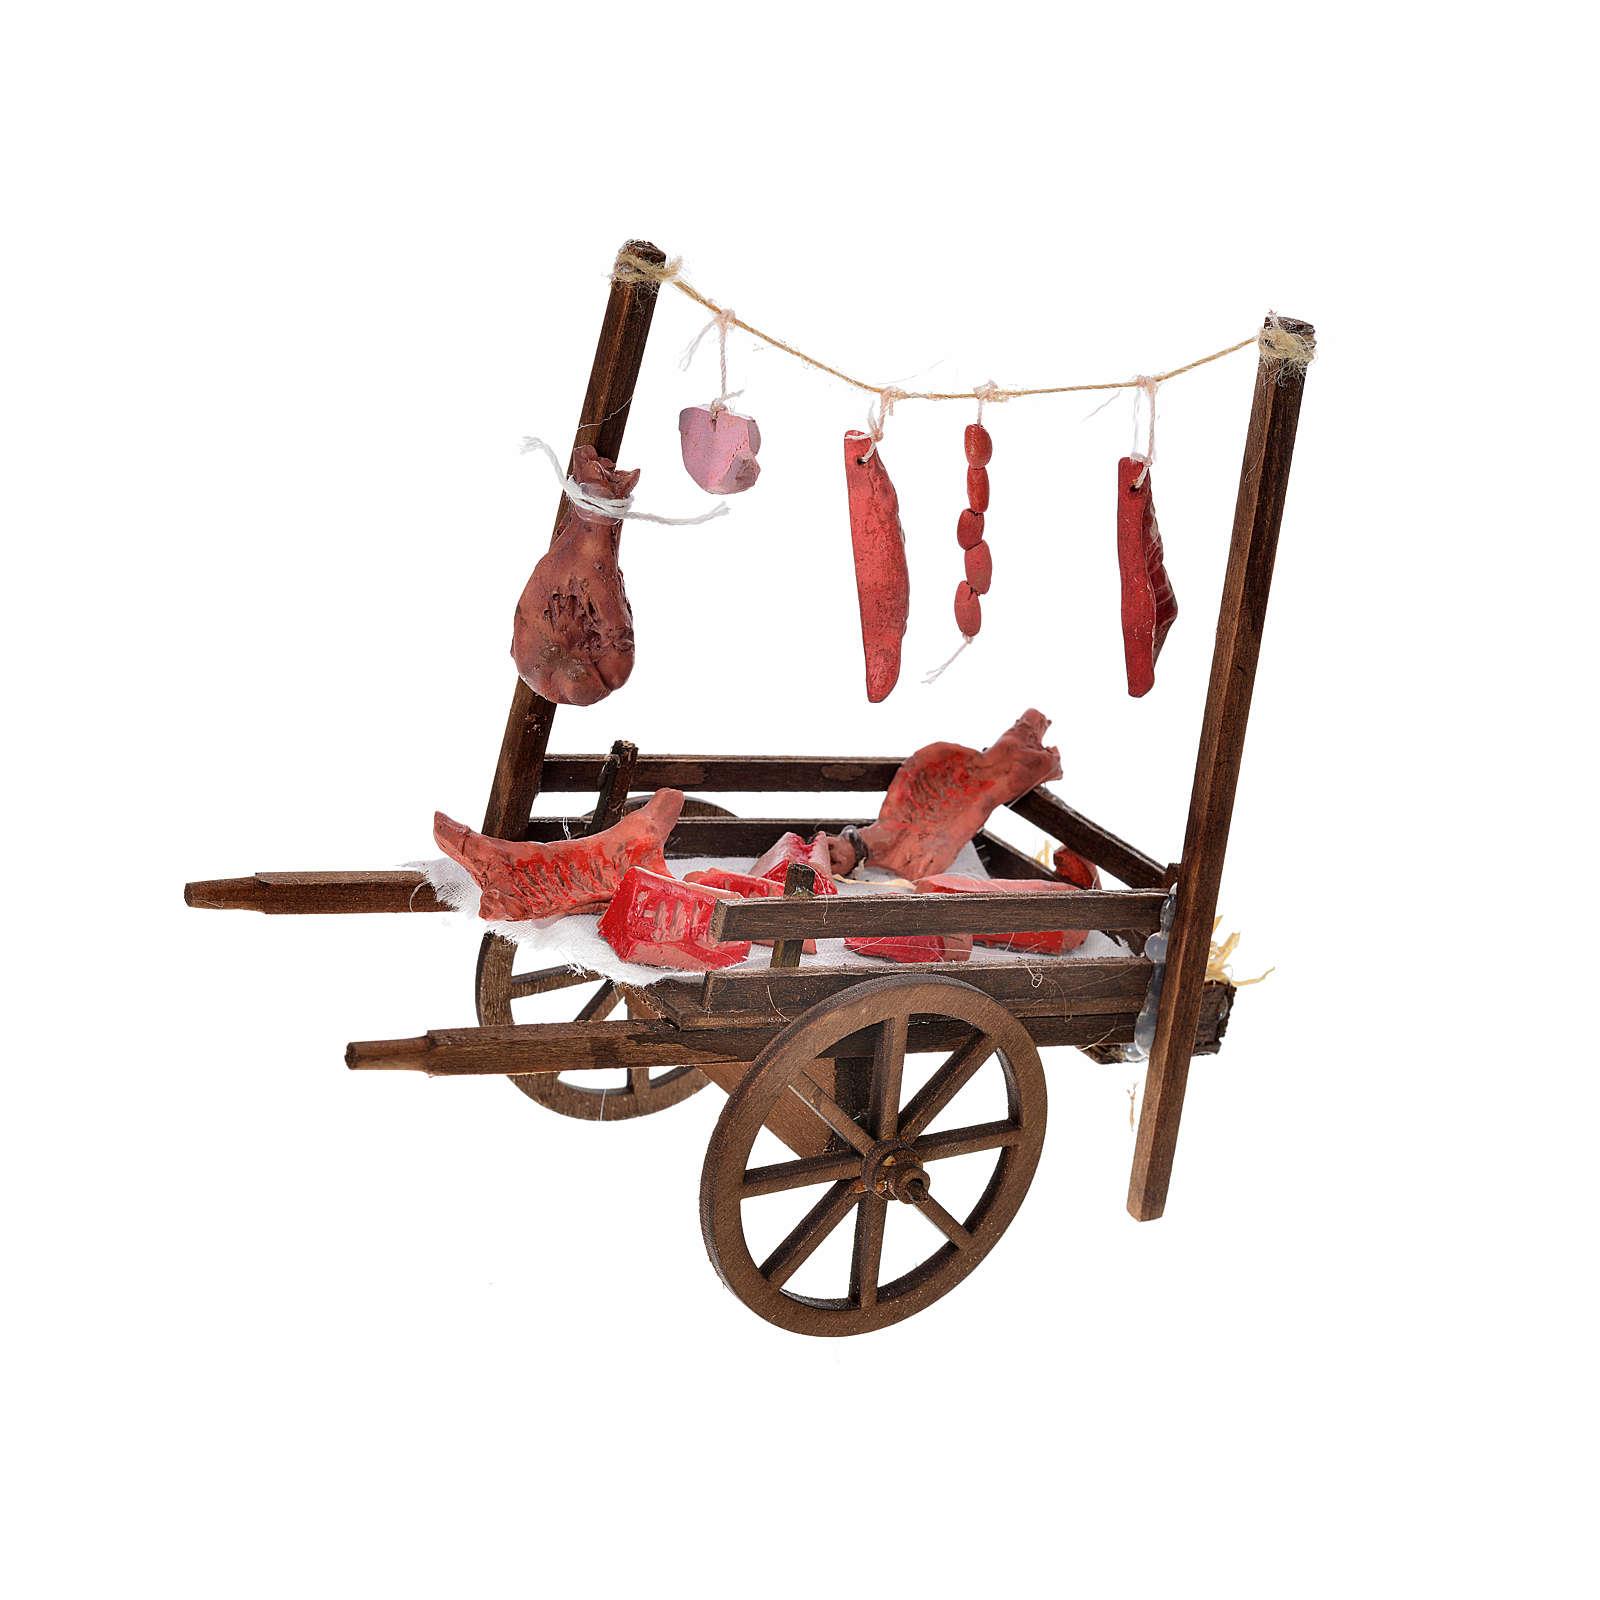 Neapolitan Nativity, terracotta butcher's cart, 15x18x8cm 4